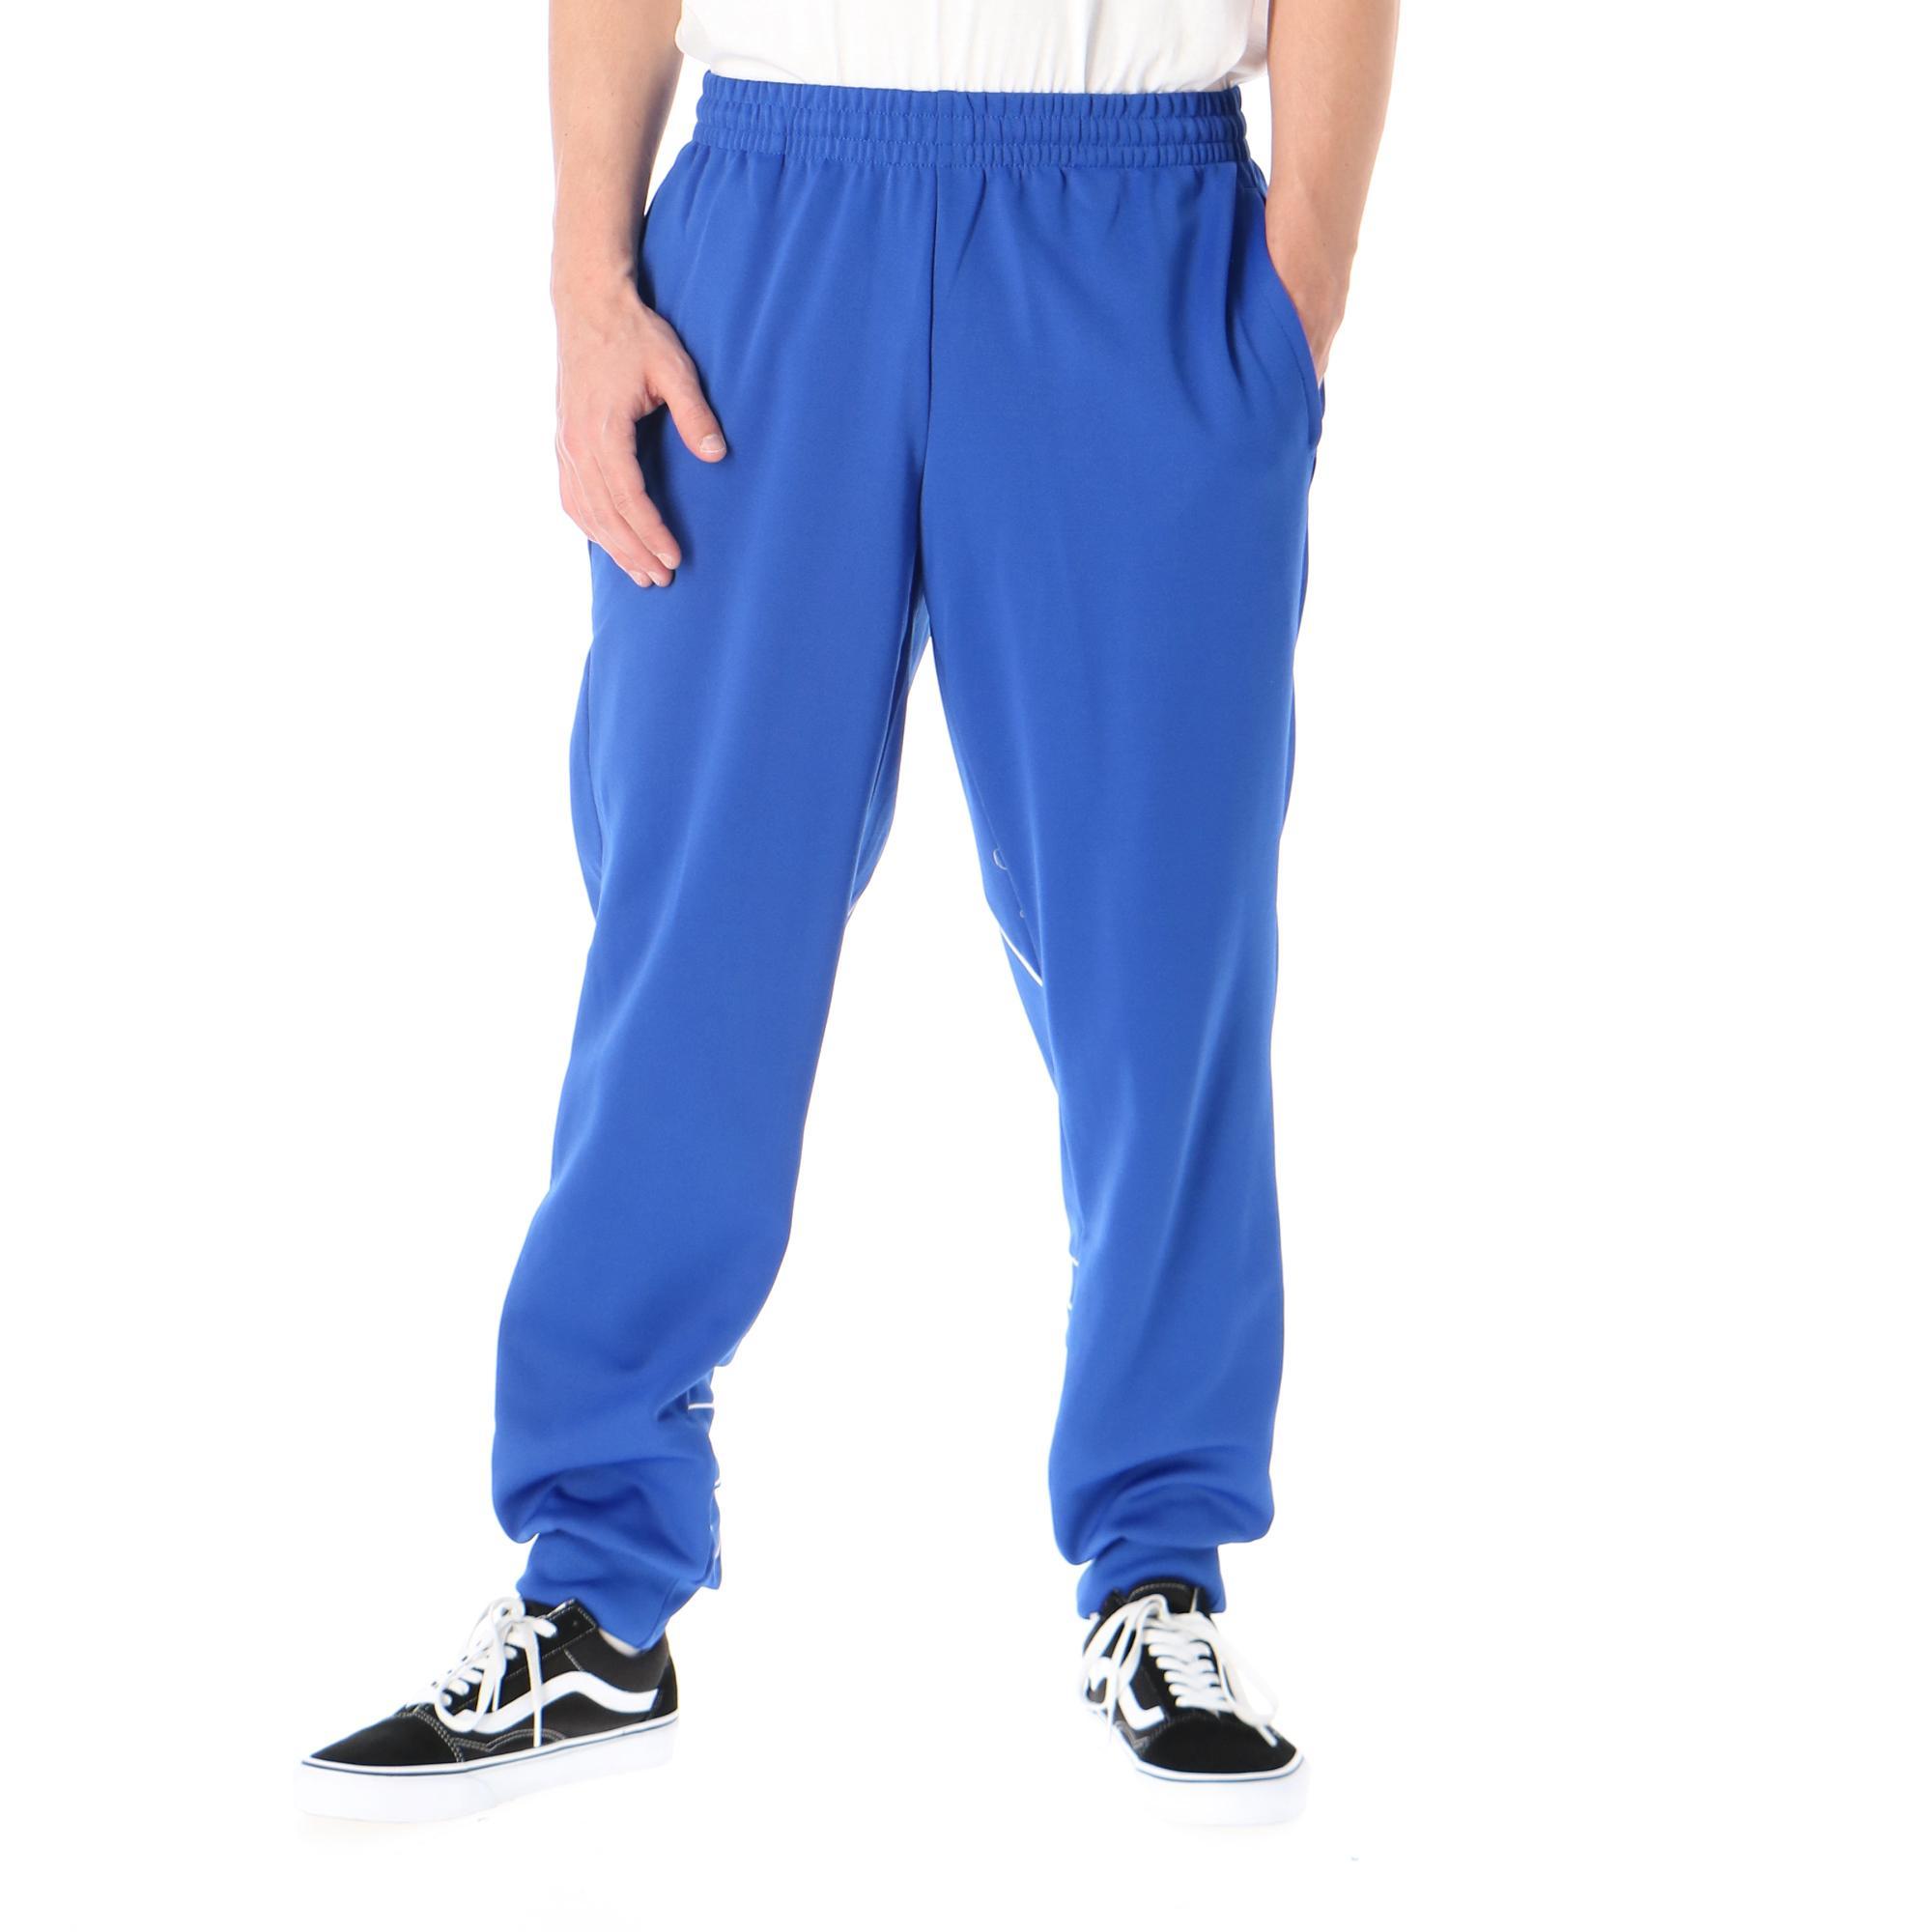 Adidas B Tf Out Ply Tp Team royal blue white